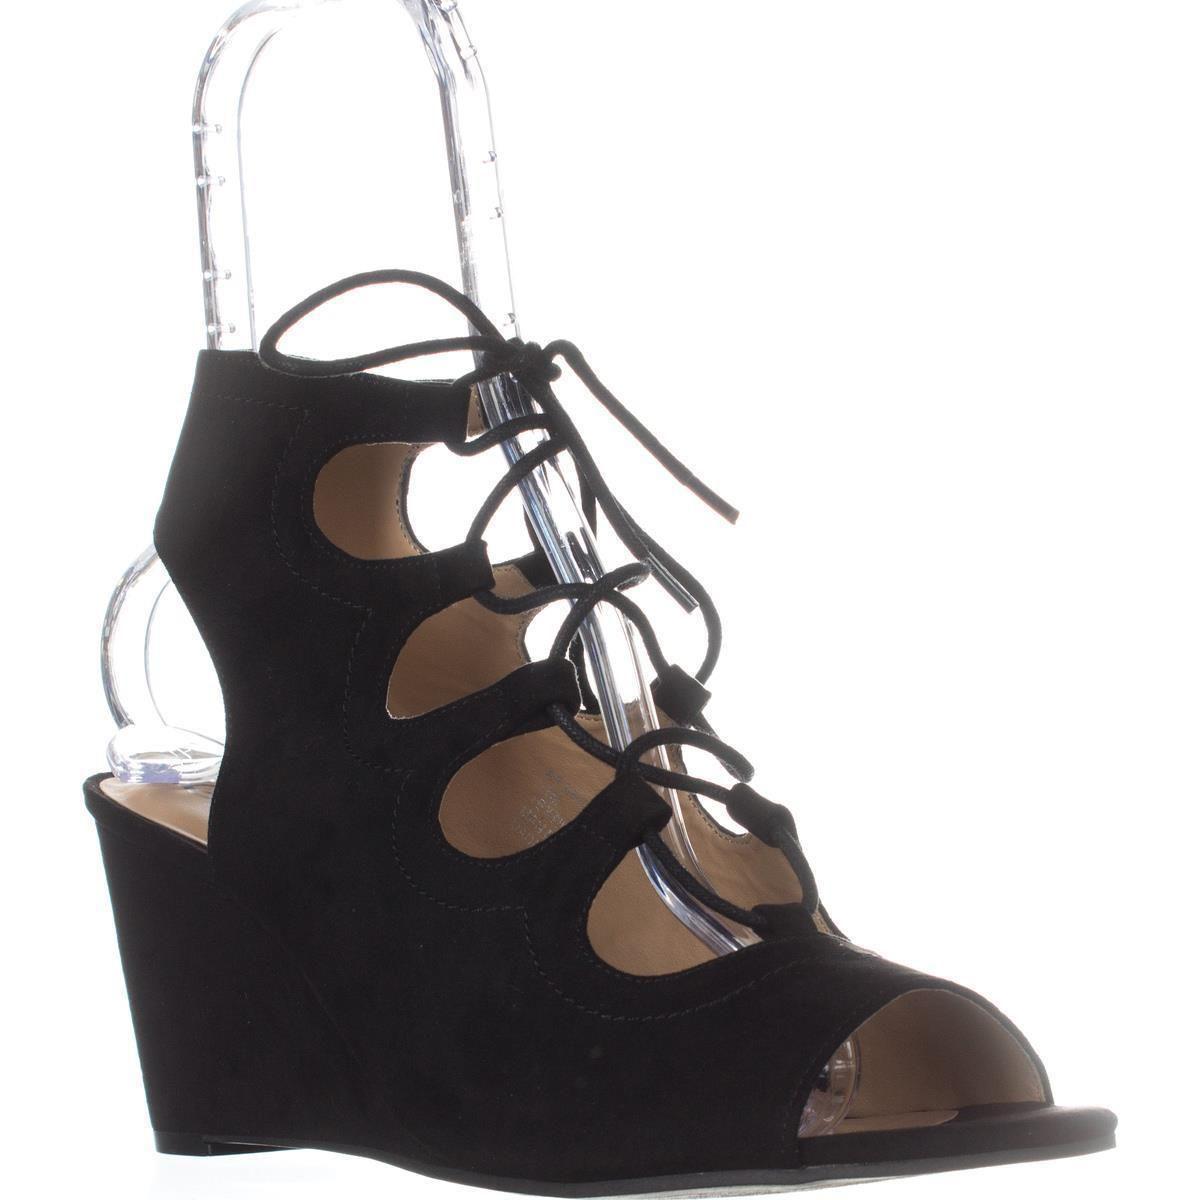 5c71263bfe Lyst - American Rag Ar35 Suriya Lace-up Wedge Sandals, Black in Black